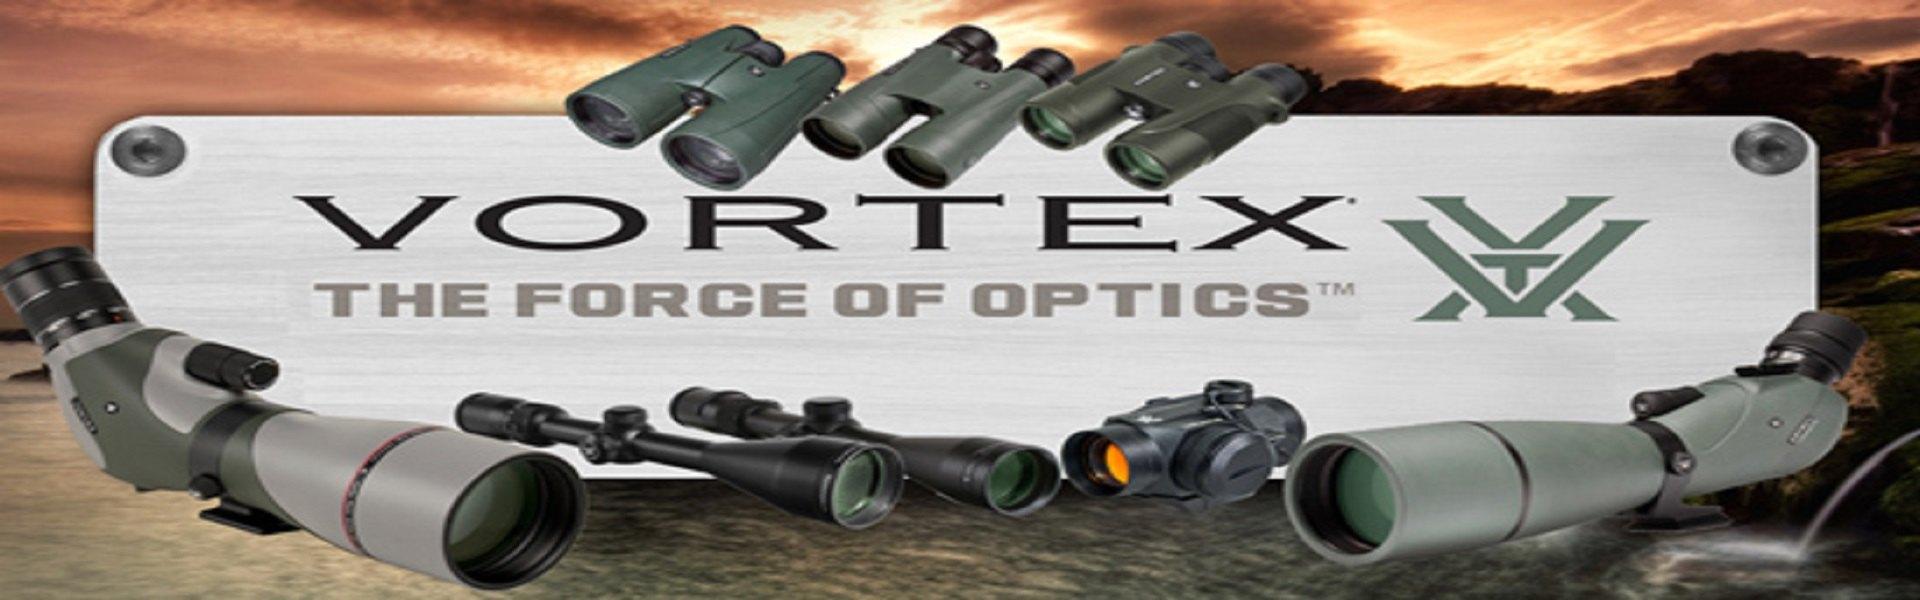 Vortex Canada